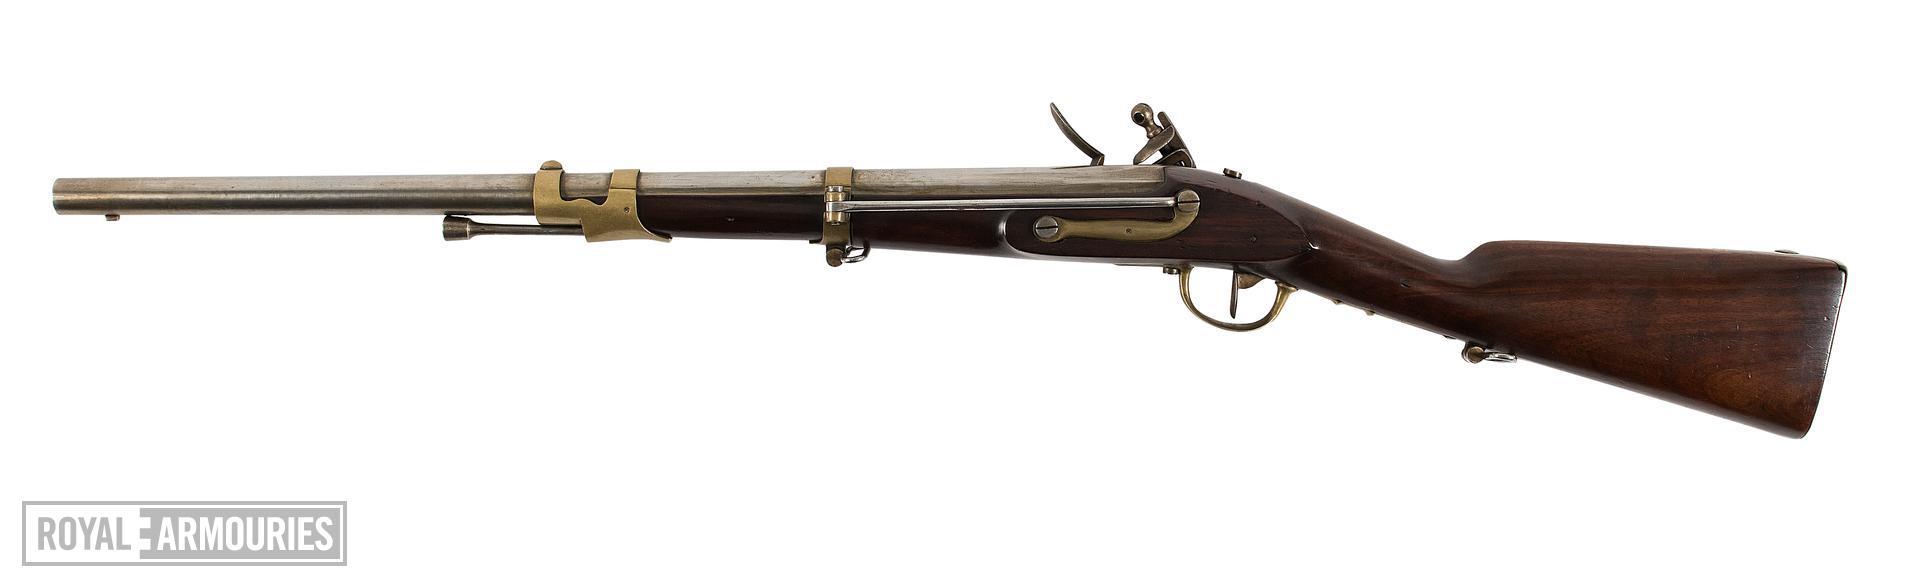 Flintlock muzzle-loading carbine - Cavalry Type